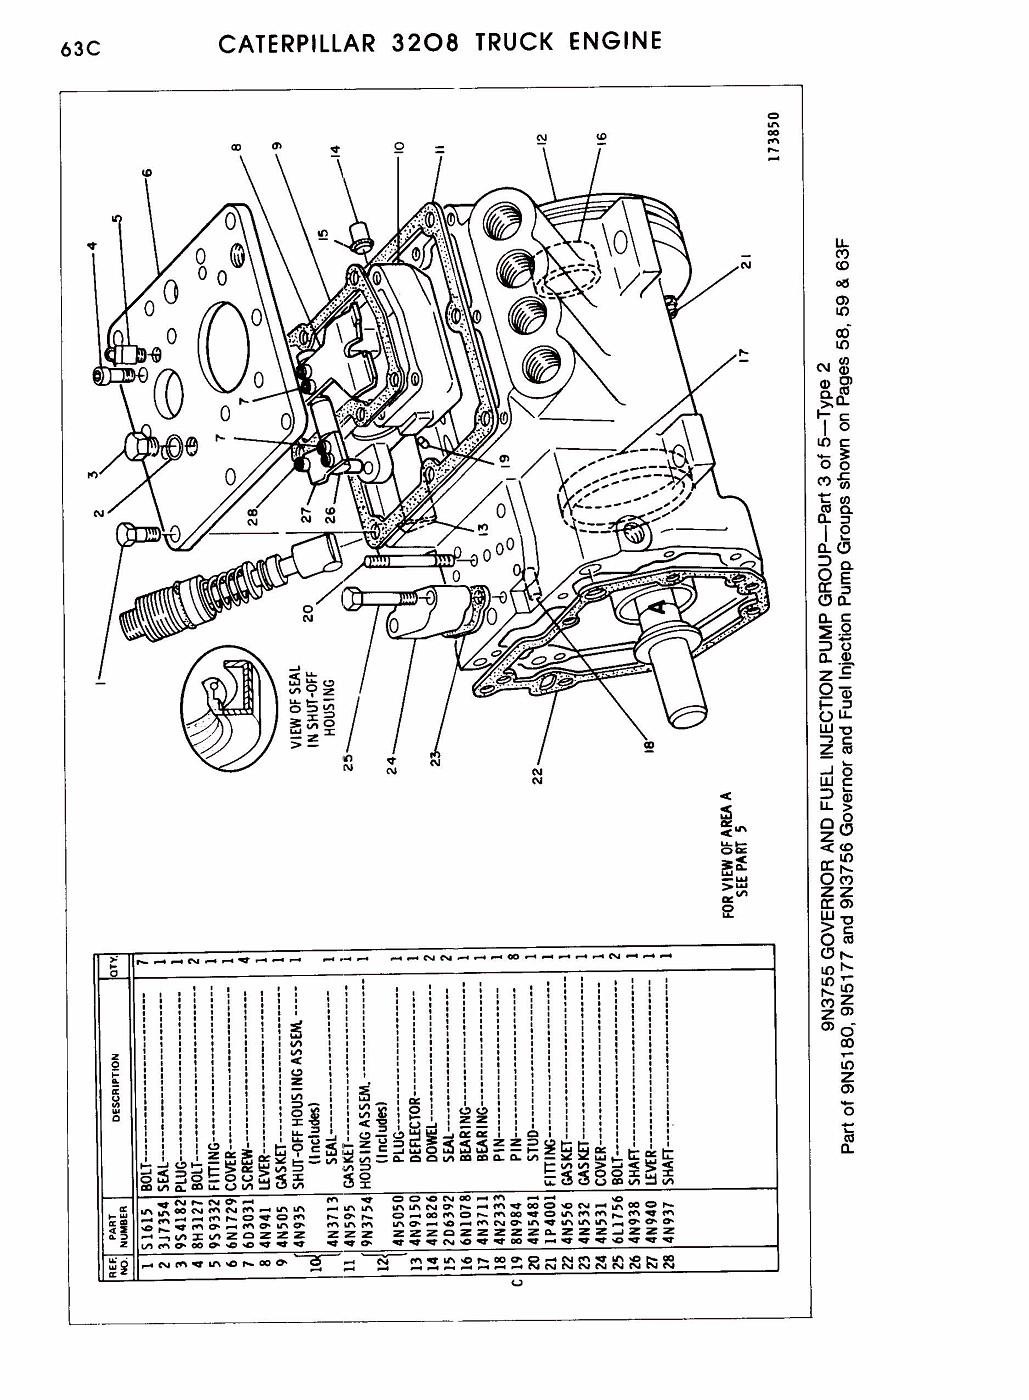 photo 3208 parts manual pagina 126 cat 3208 dieselengine parts rh public fotki com cat 3208 service manual cat 3208 manual pdf